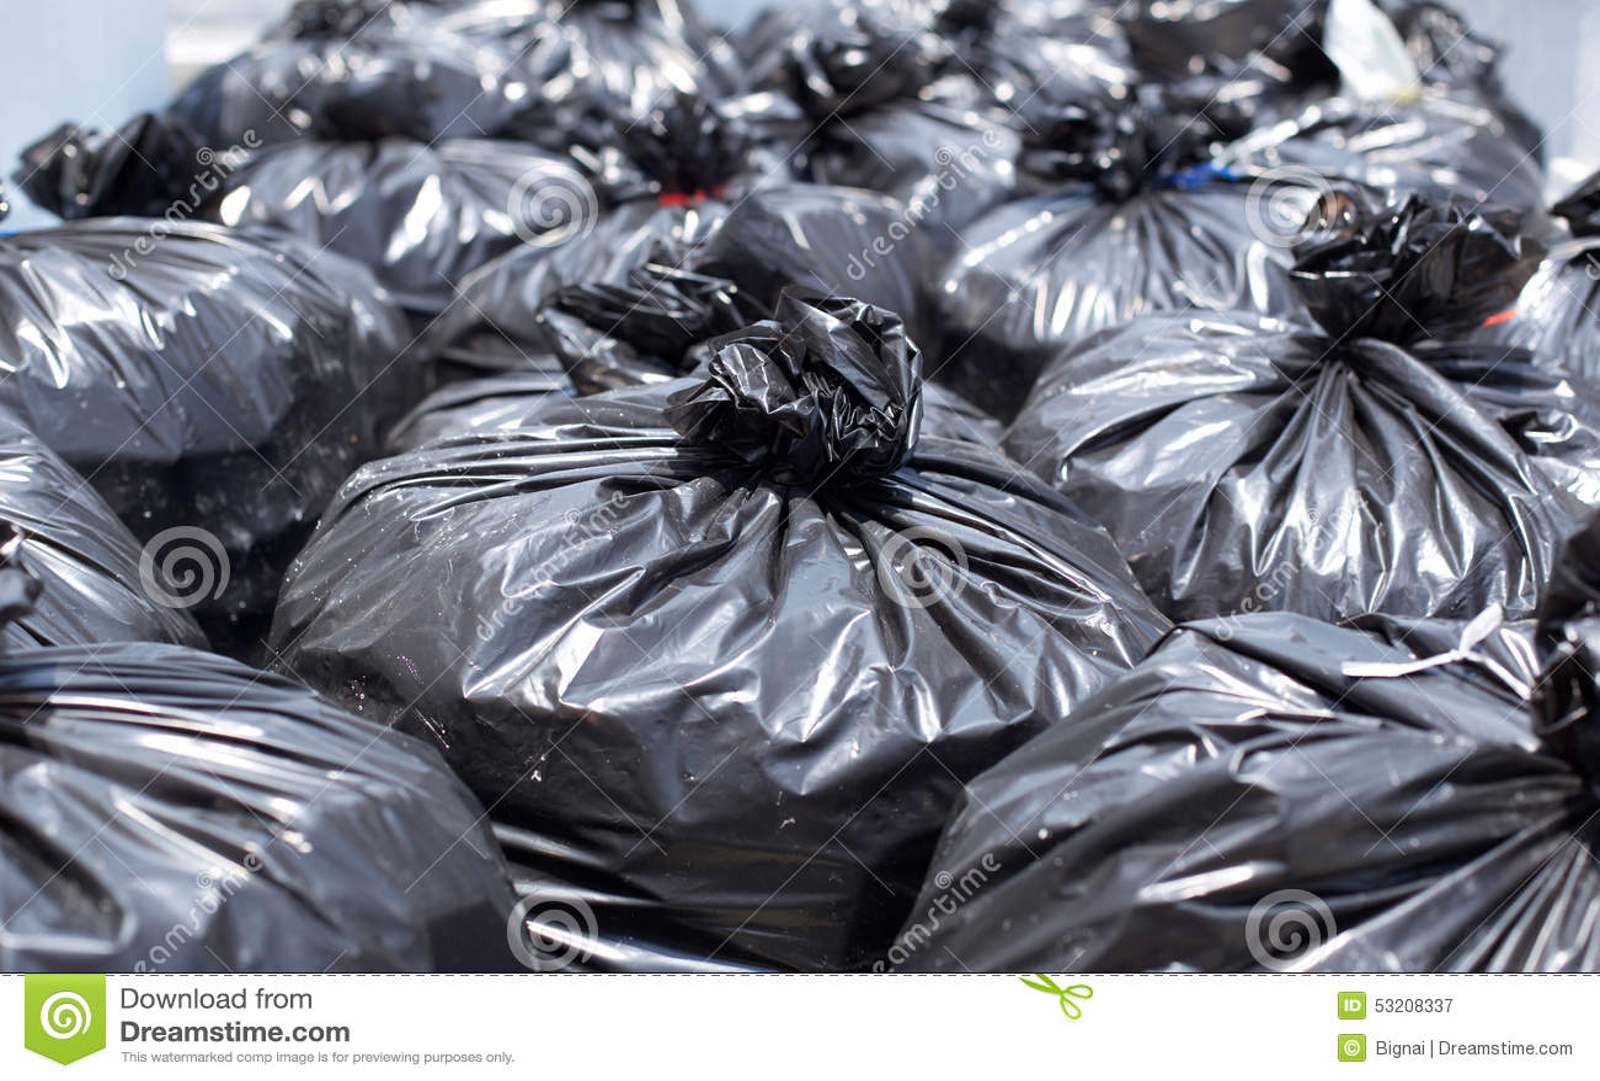 Black Garbage Bag On The Street Stock Image - Image: 53208337